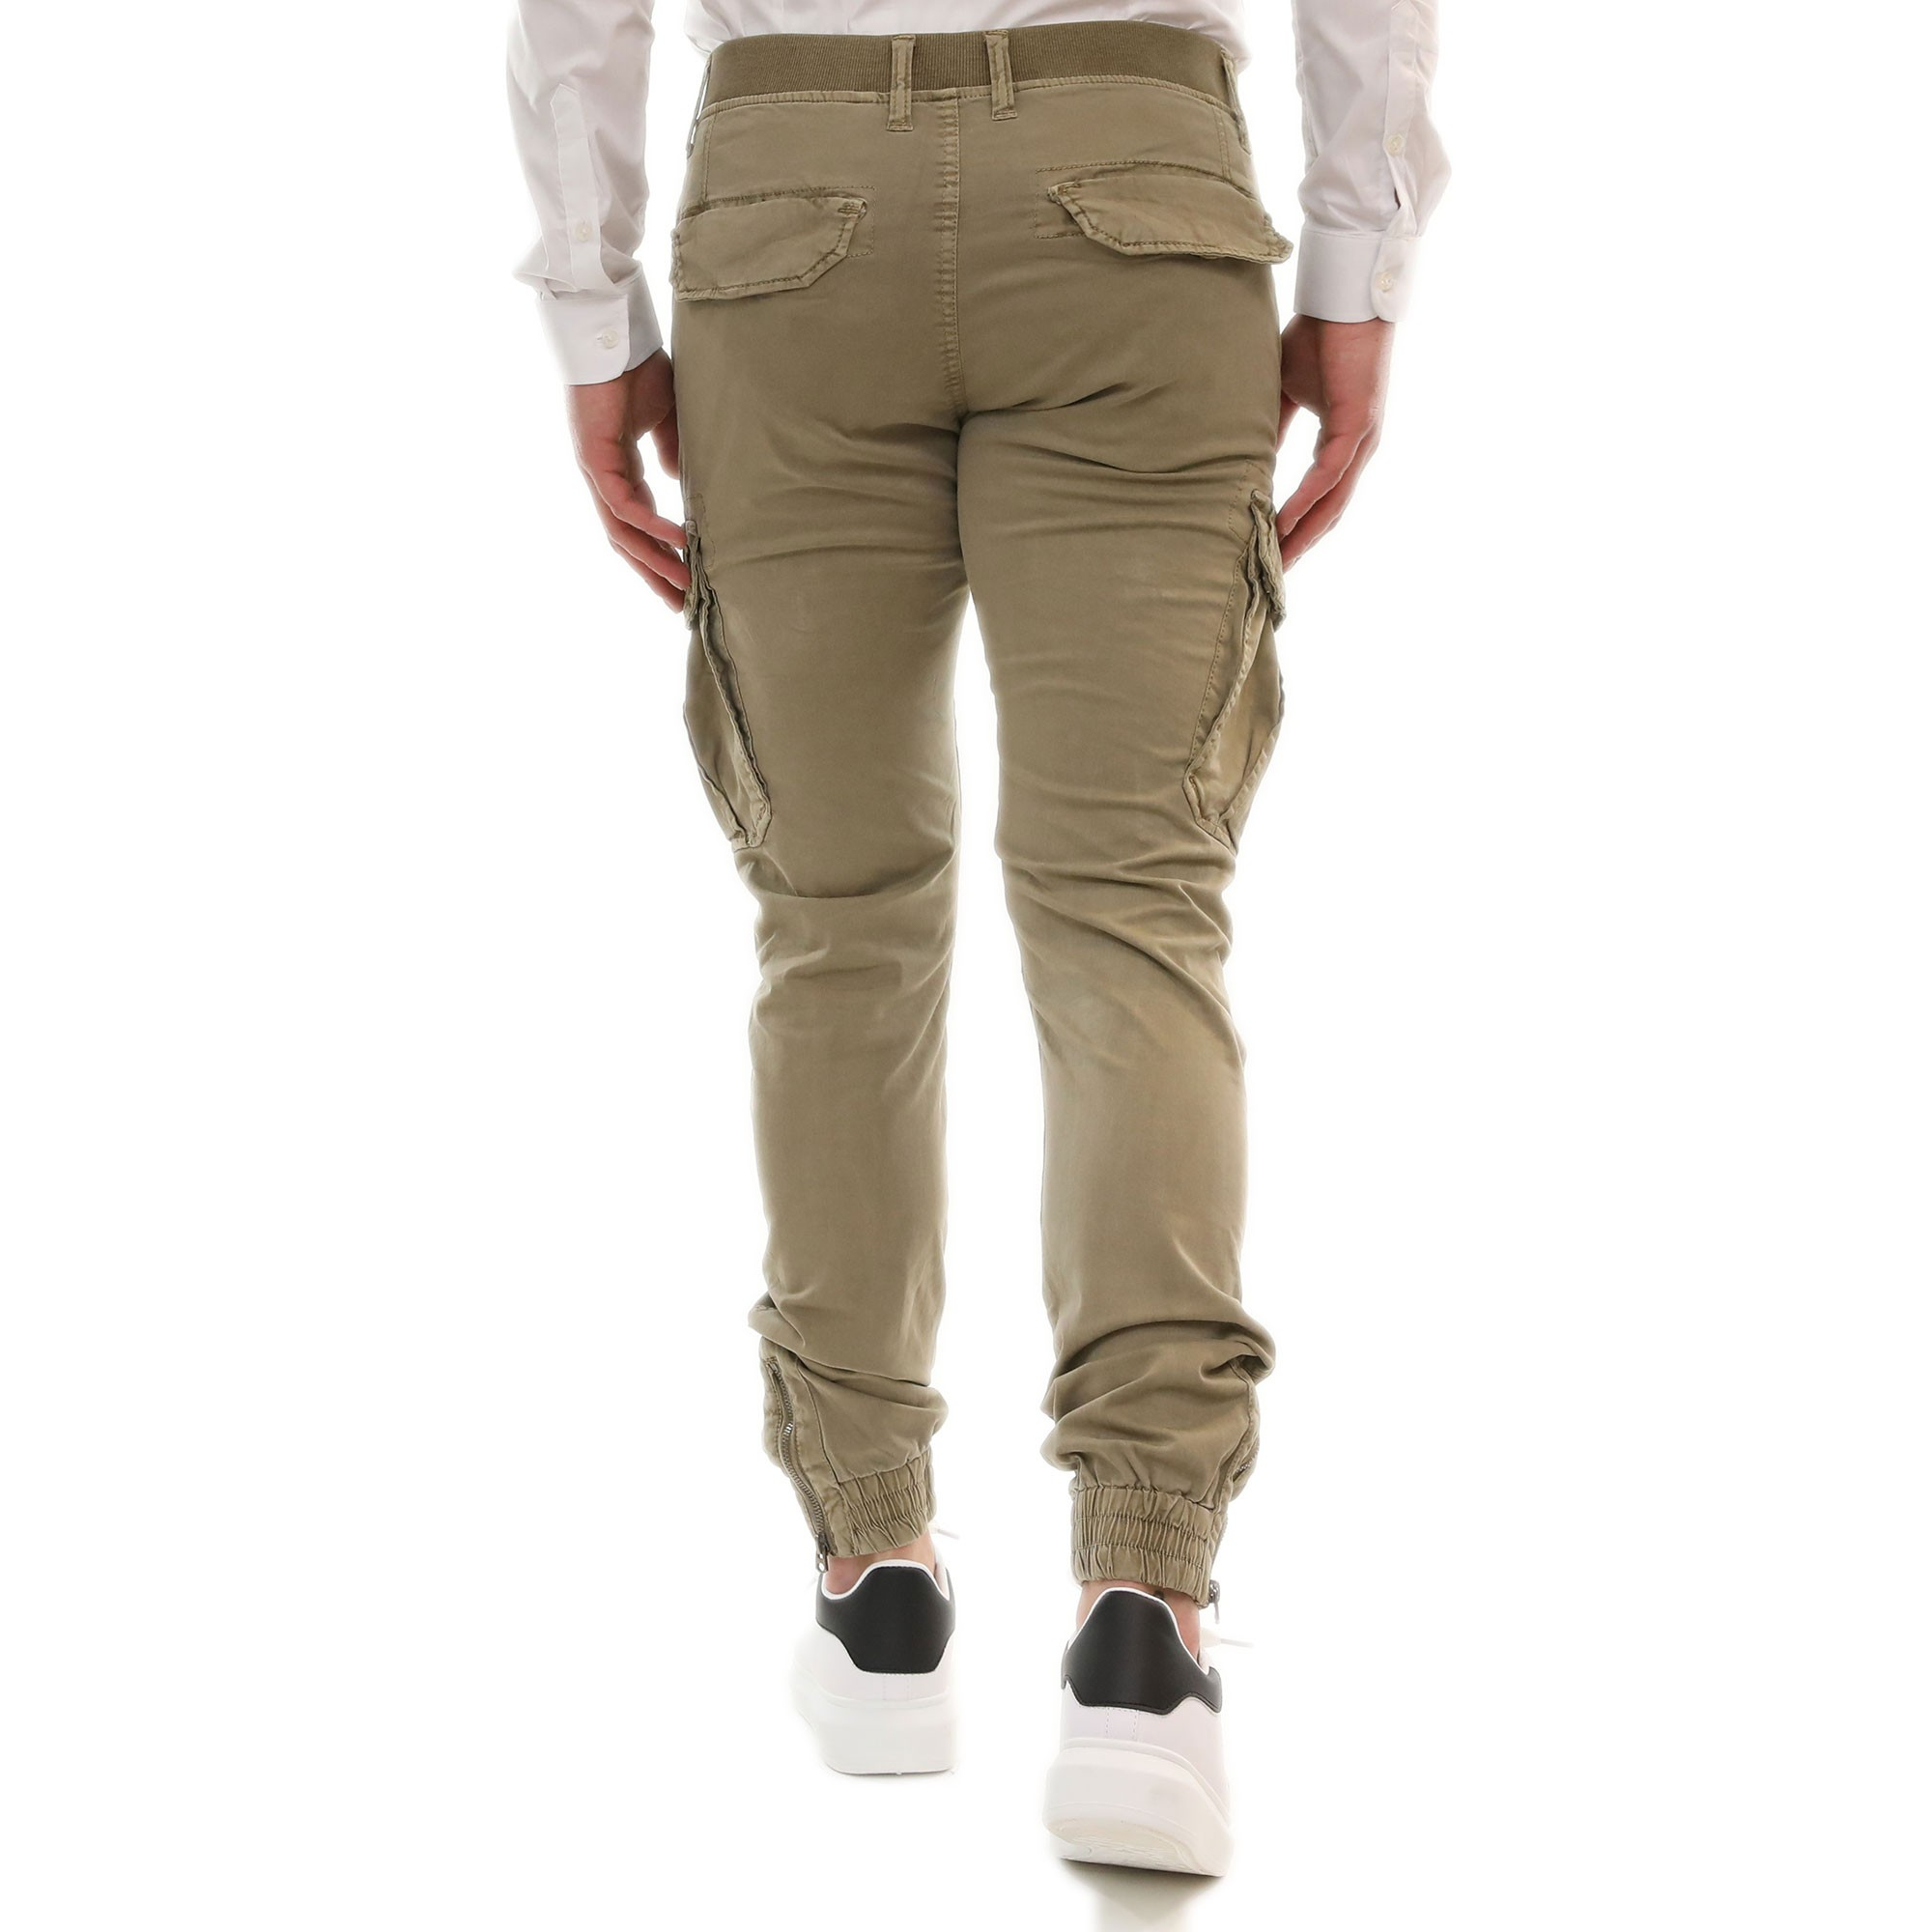 Pantalone-Uomo-Cargo-Primaverile-Con-Tasconi-Verde-Blu-Beige-SlimFit-Pantaloni miniatura 10